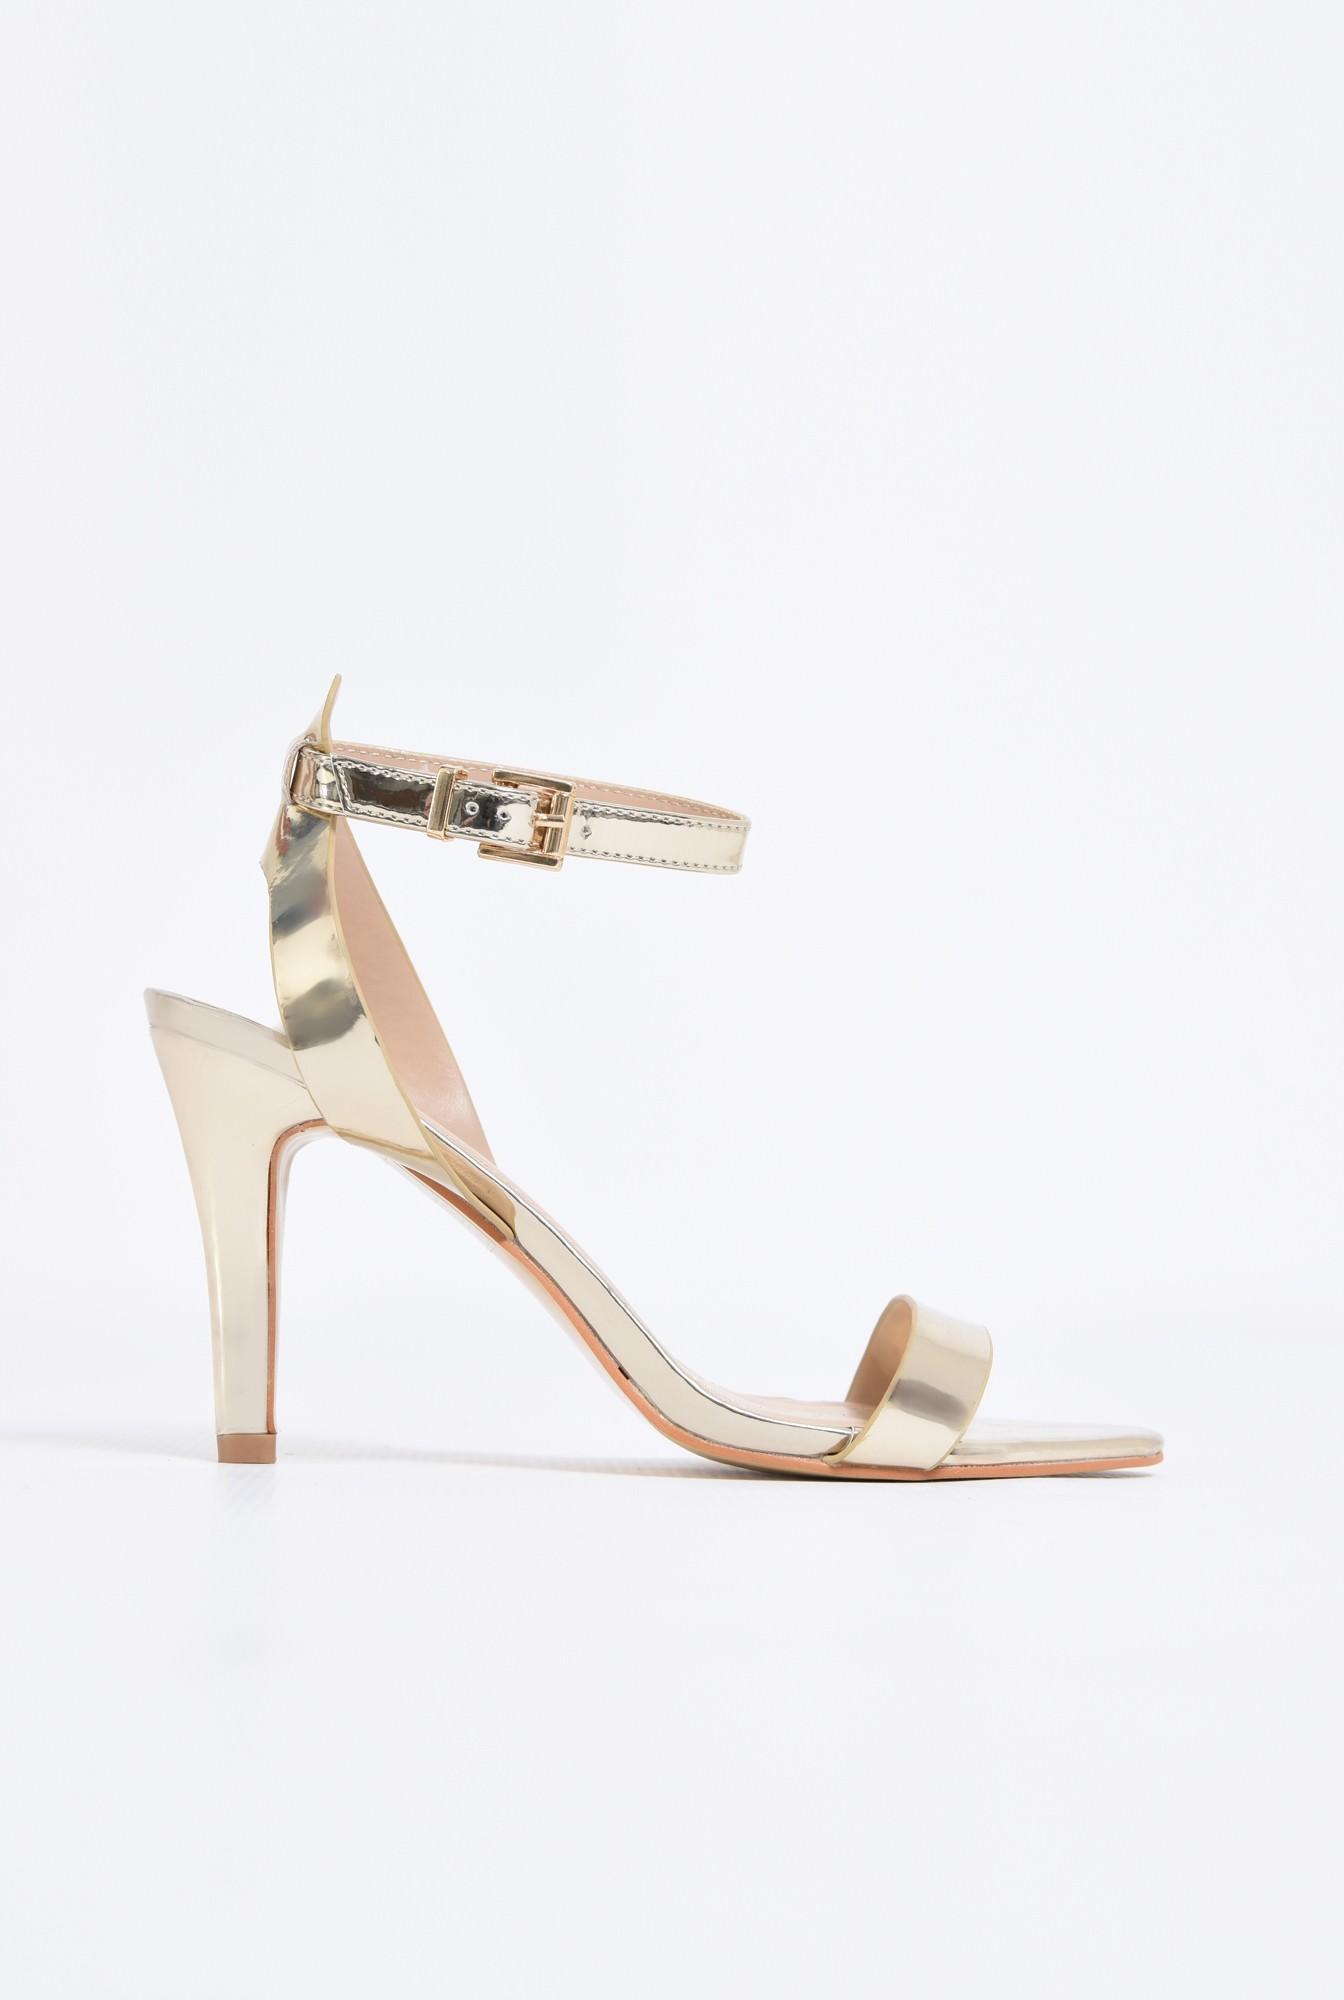 0 - sandale elegante, aurii, cu toc subtire